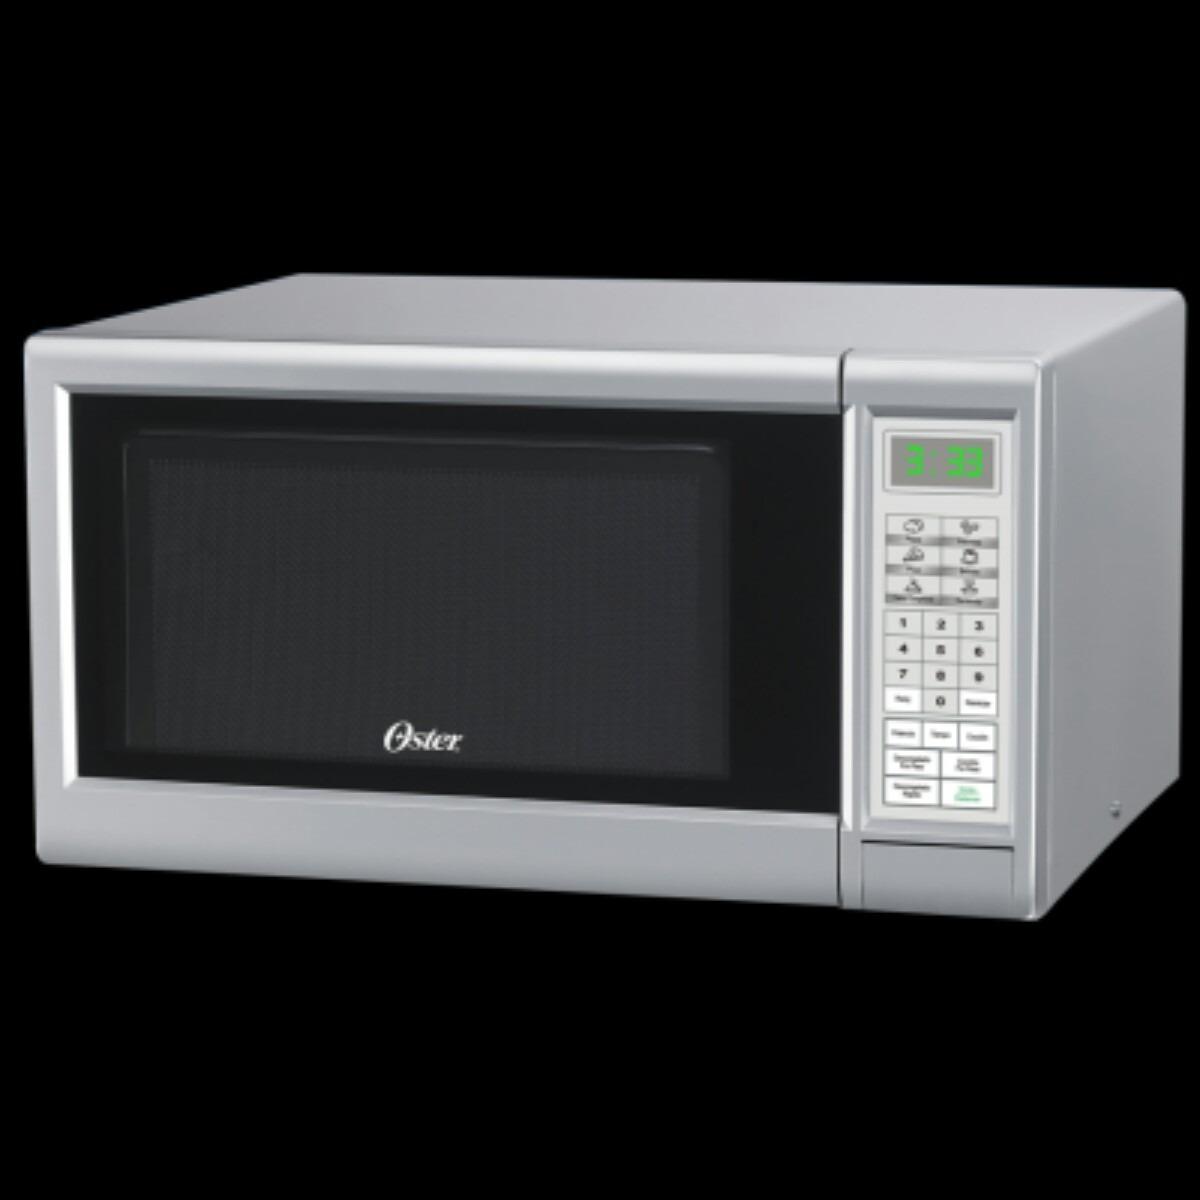 horno microondas oster 28 litros de capacidad u s 239